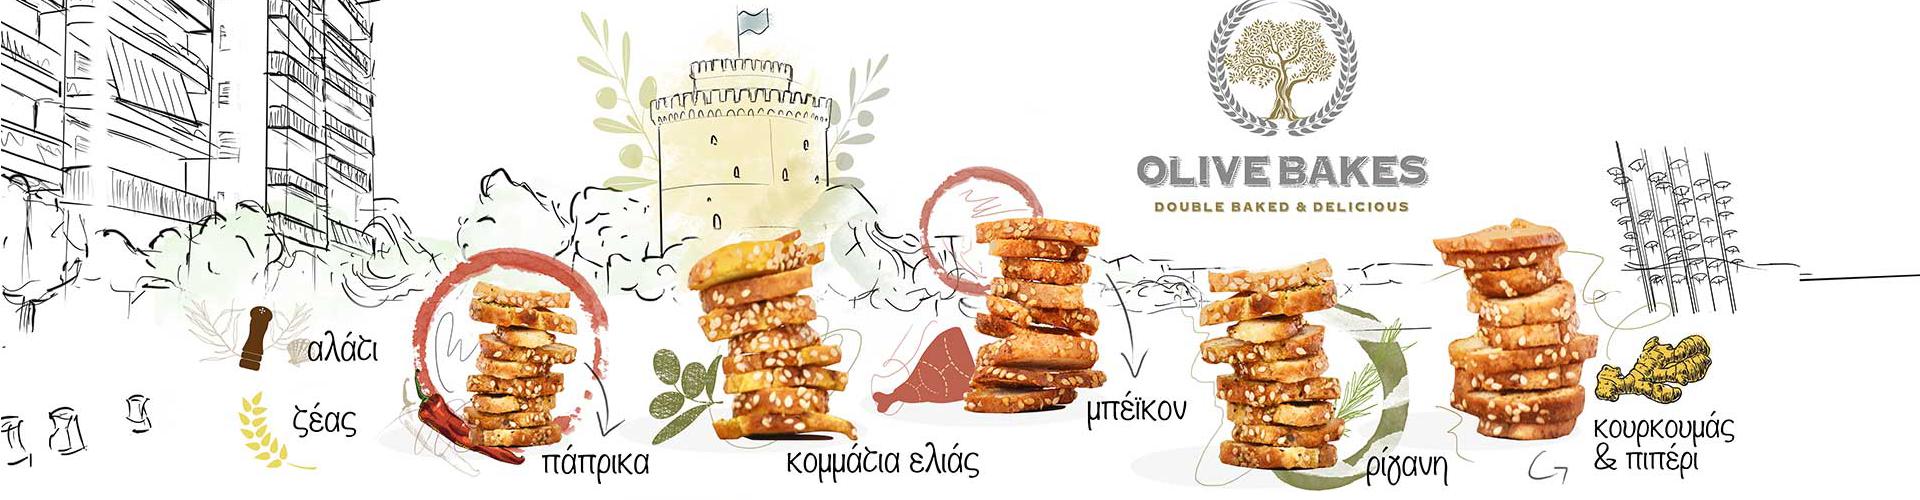 olivebakes